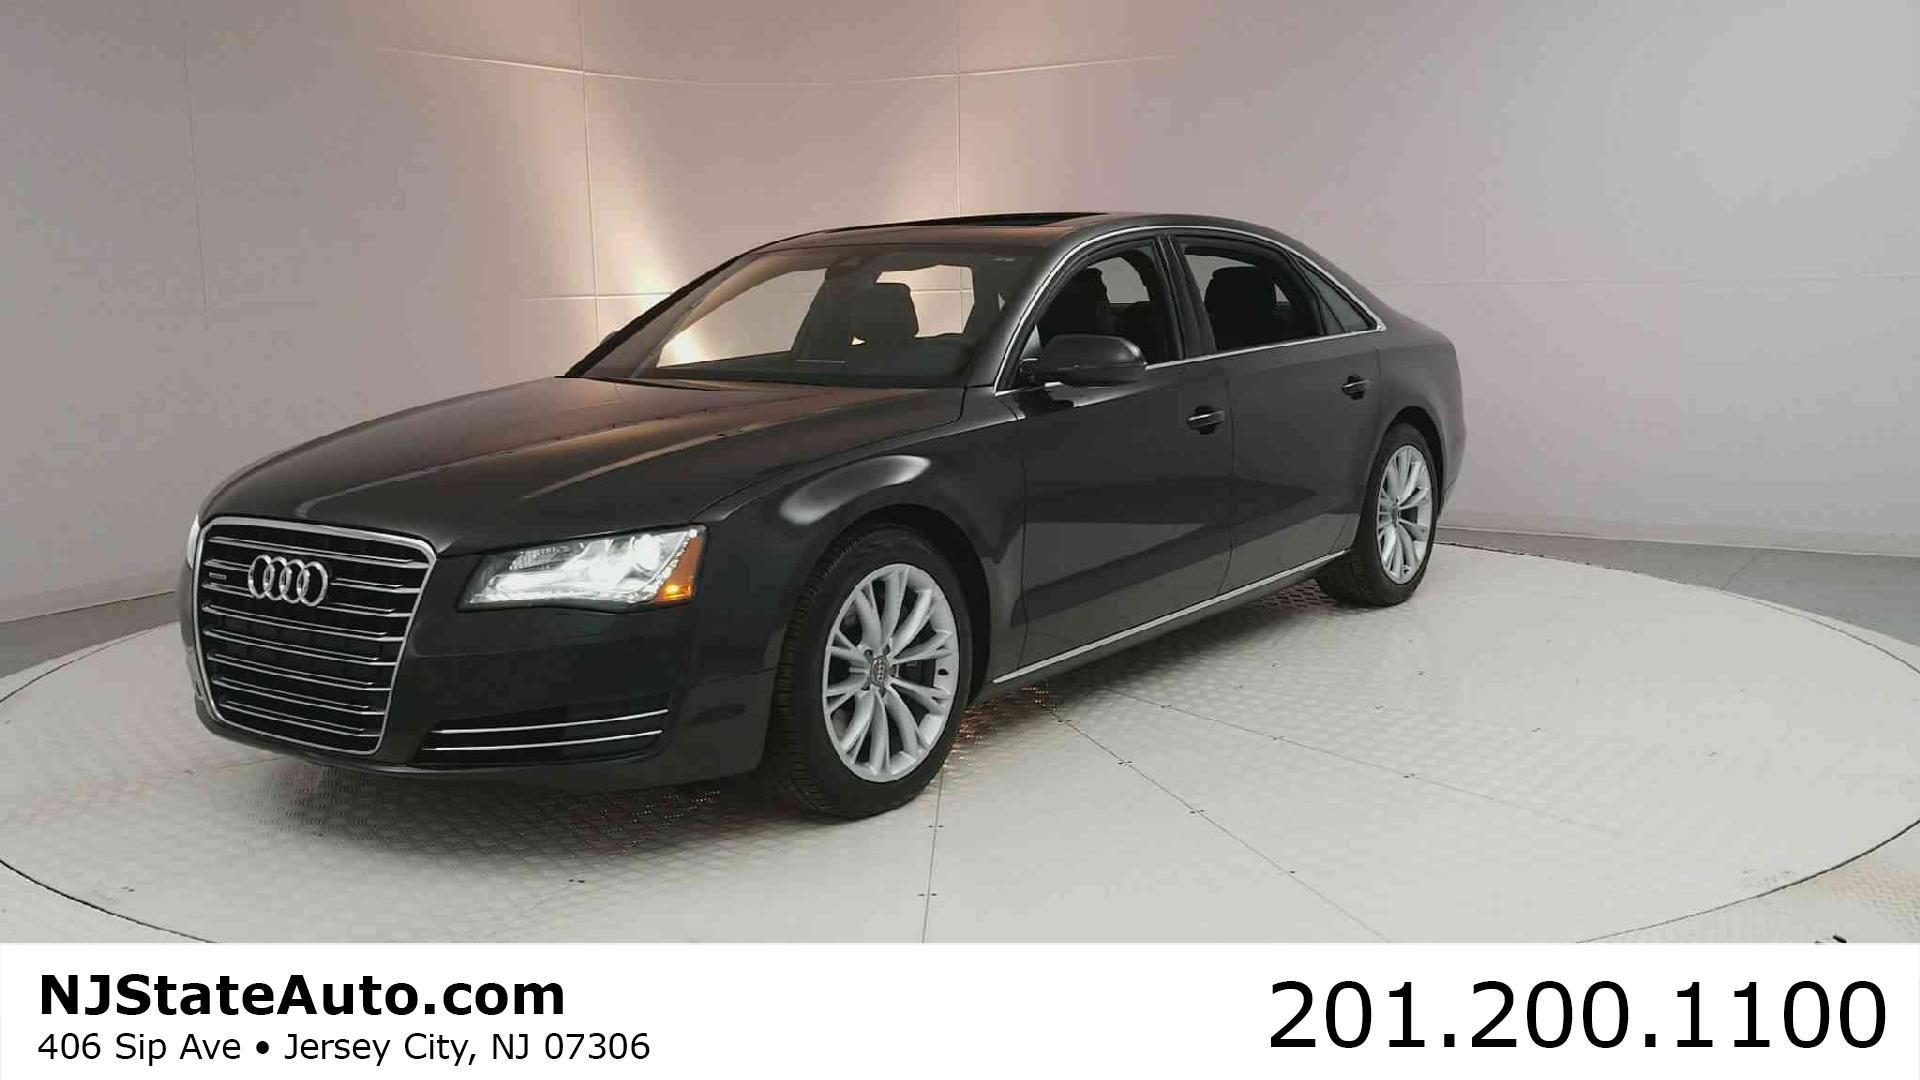 2013_Audi_A8 L_4dr Sedan 3.0L_ Jersey City NJ Jersey